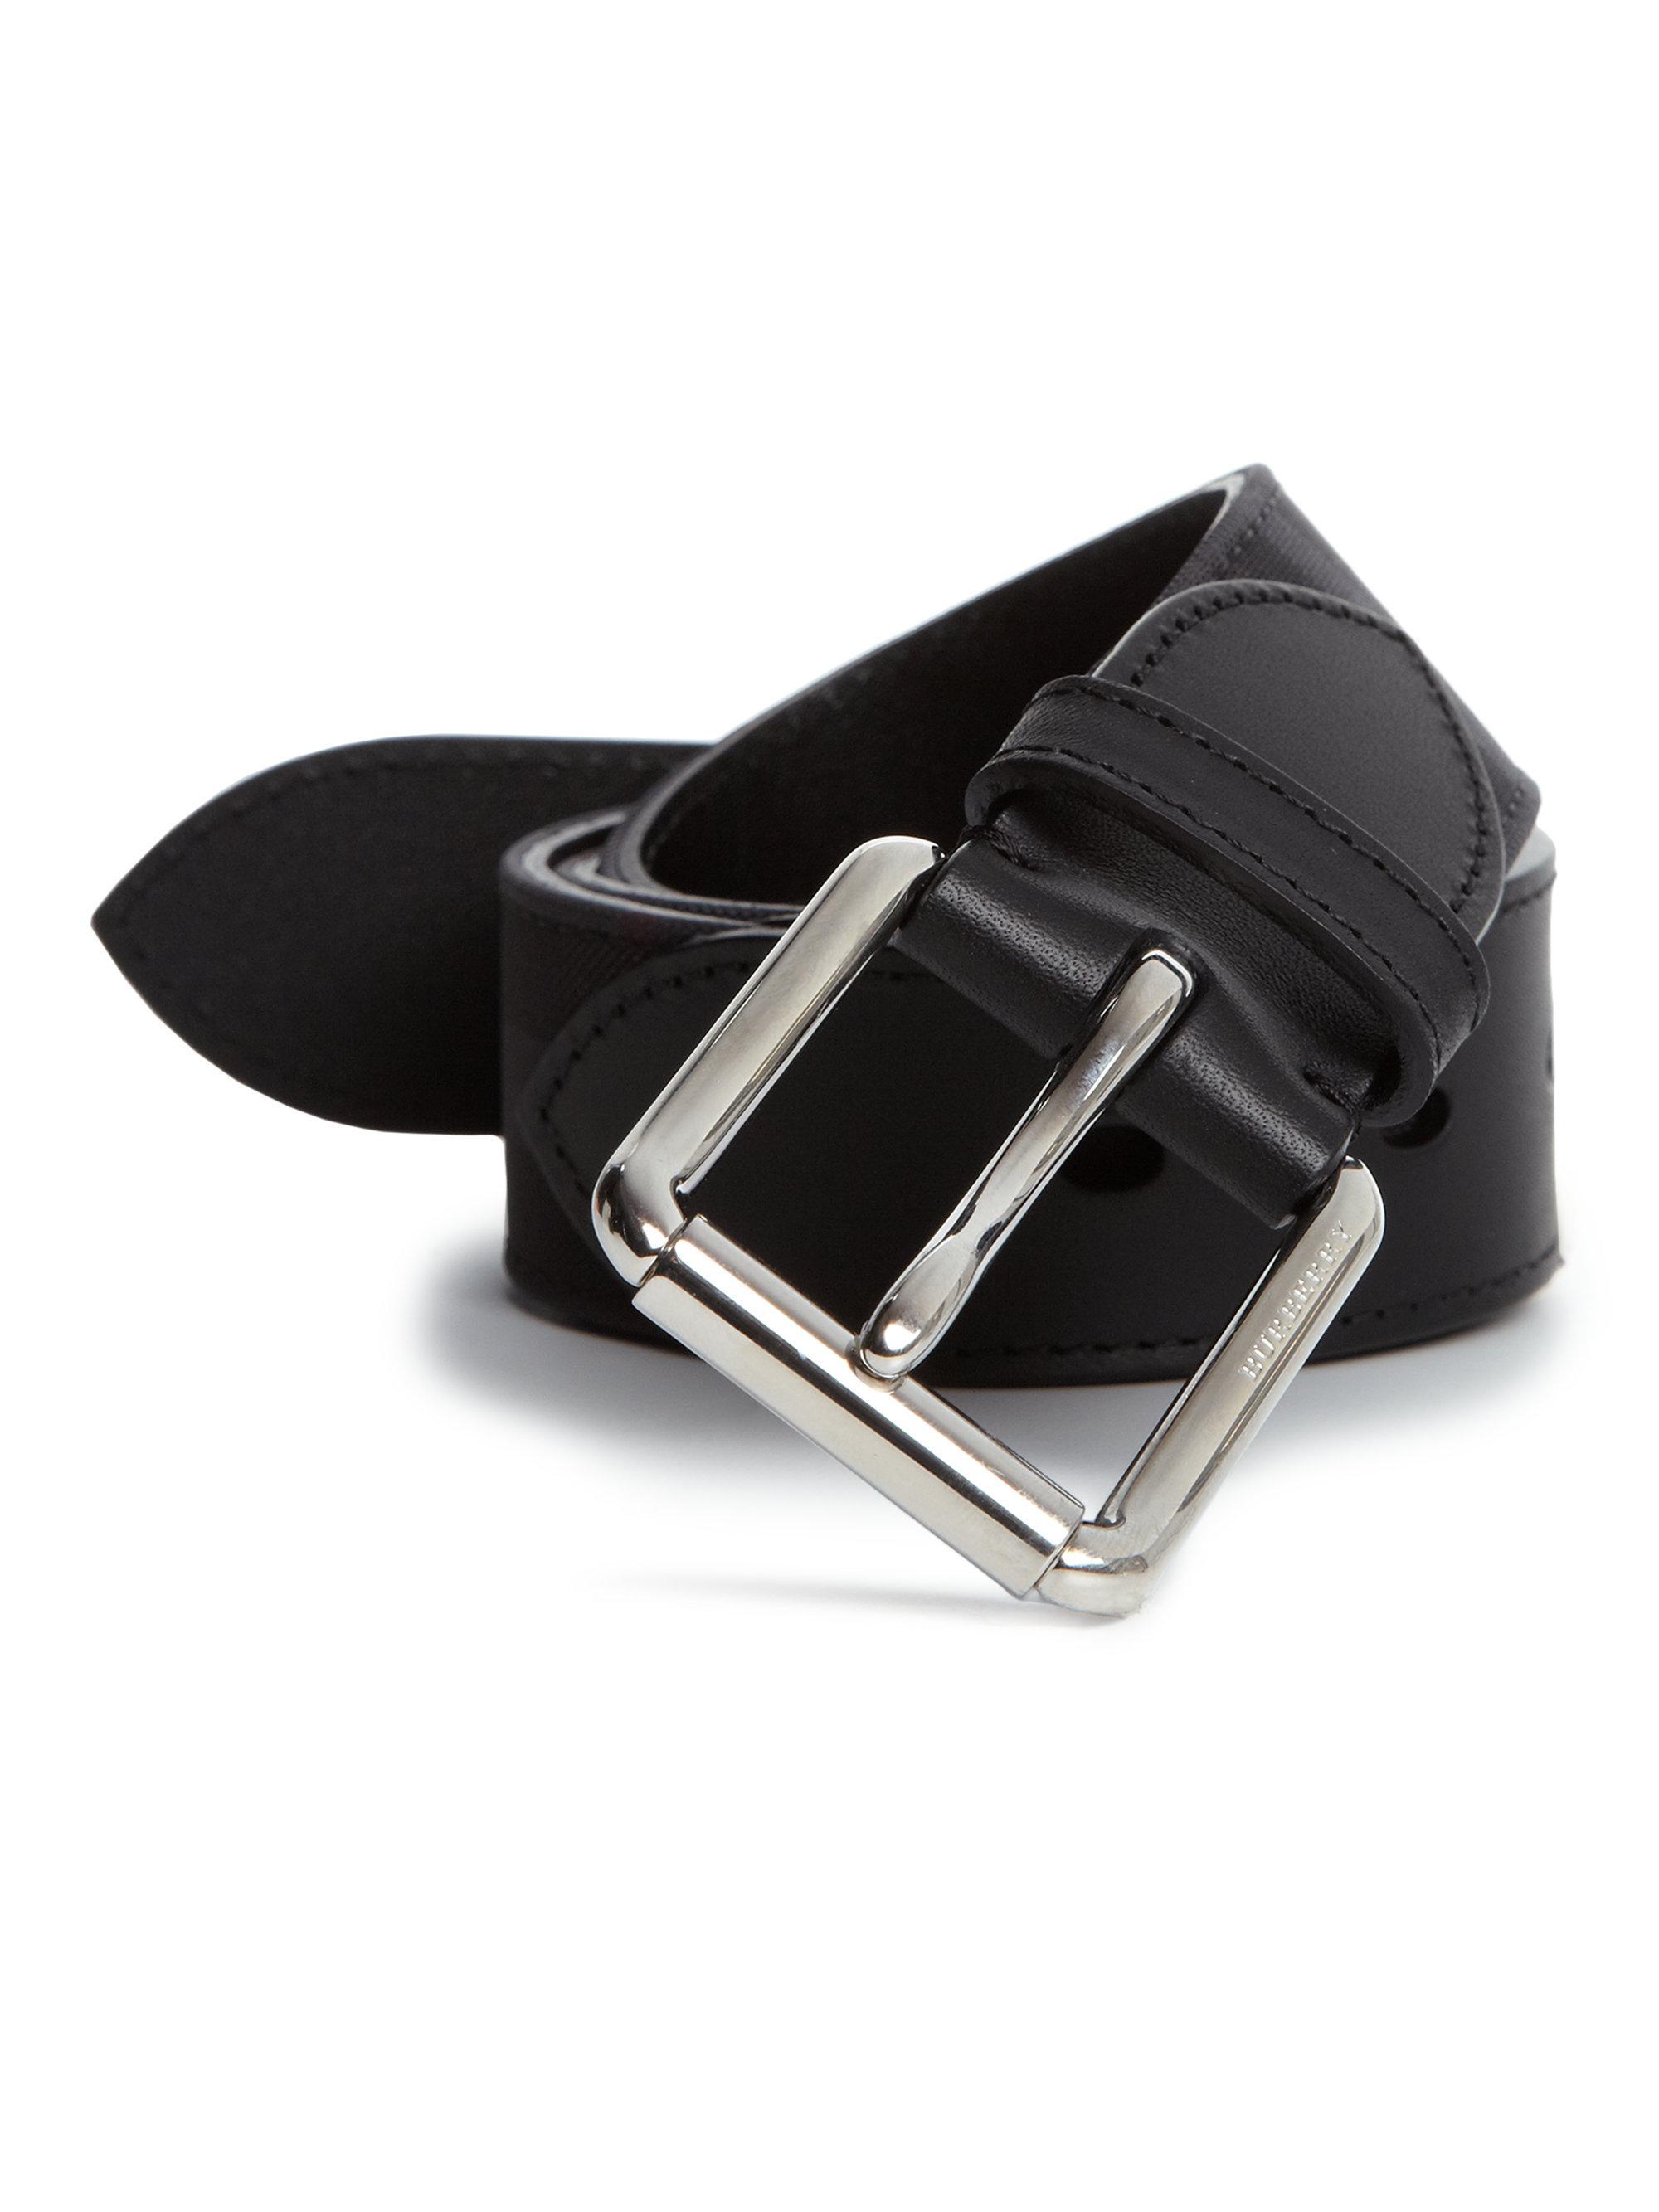 c1248455e00809 Lyst - Burberry Signature Check Belt in Black for Men